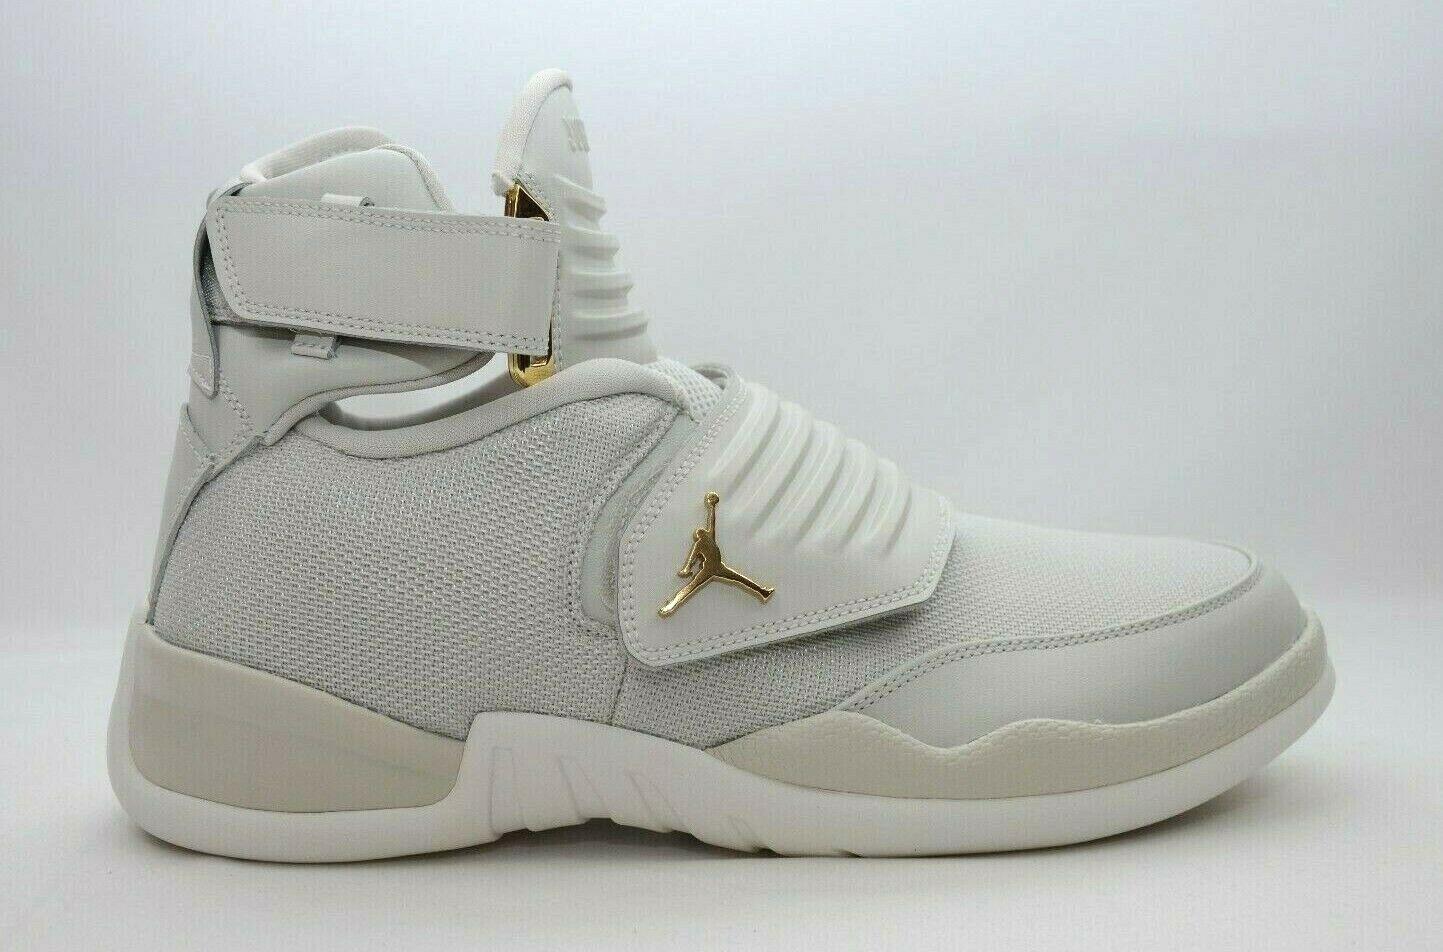 Nike Jordan Jordan Jordan Generation 23 Light Bone Men's Size 8.5-12 New in Box AA1294 005 bf17d7